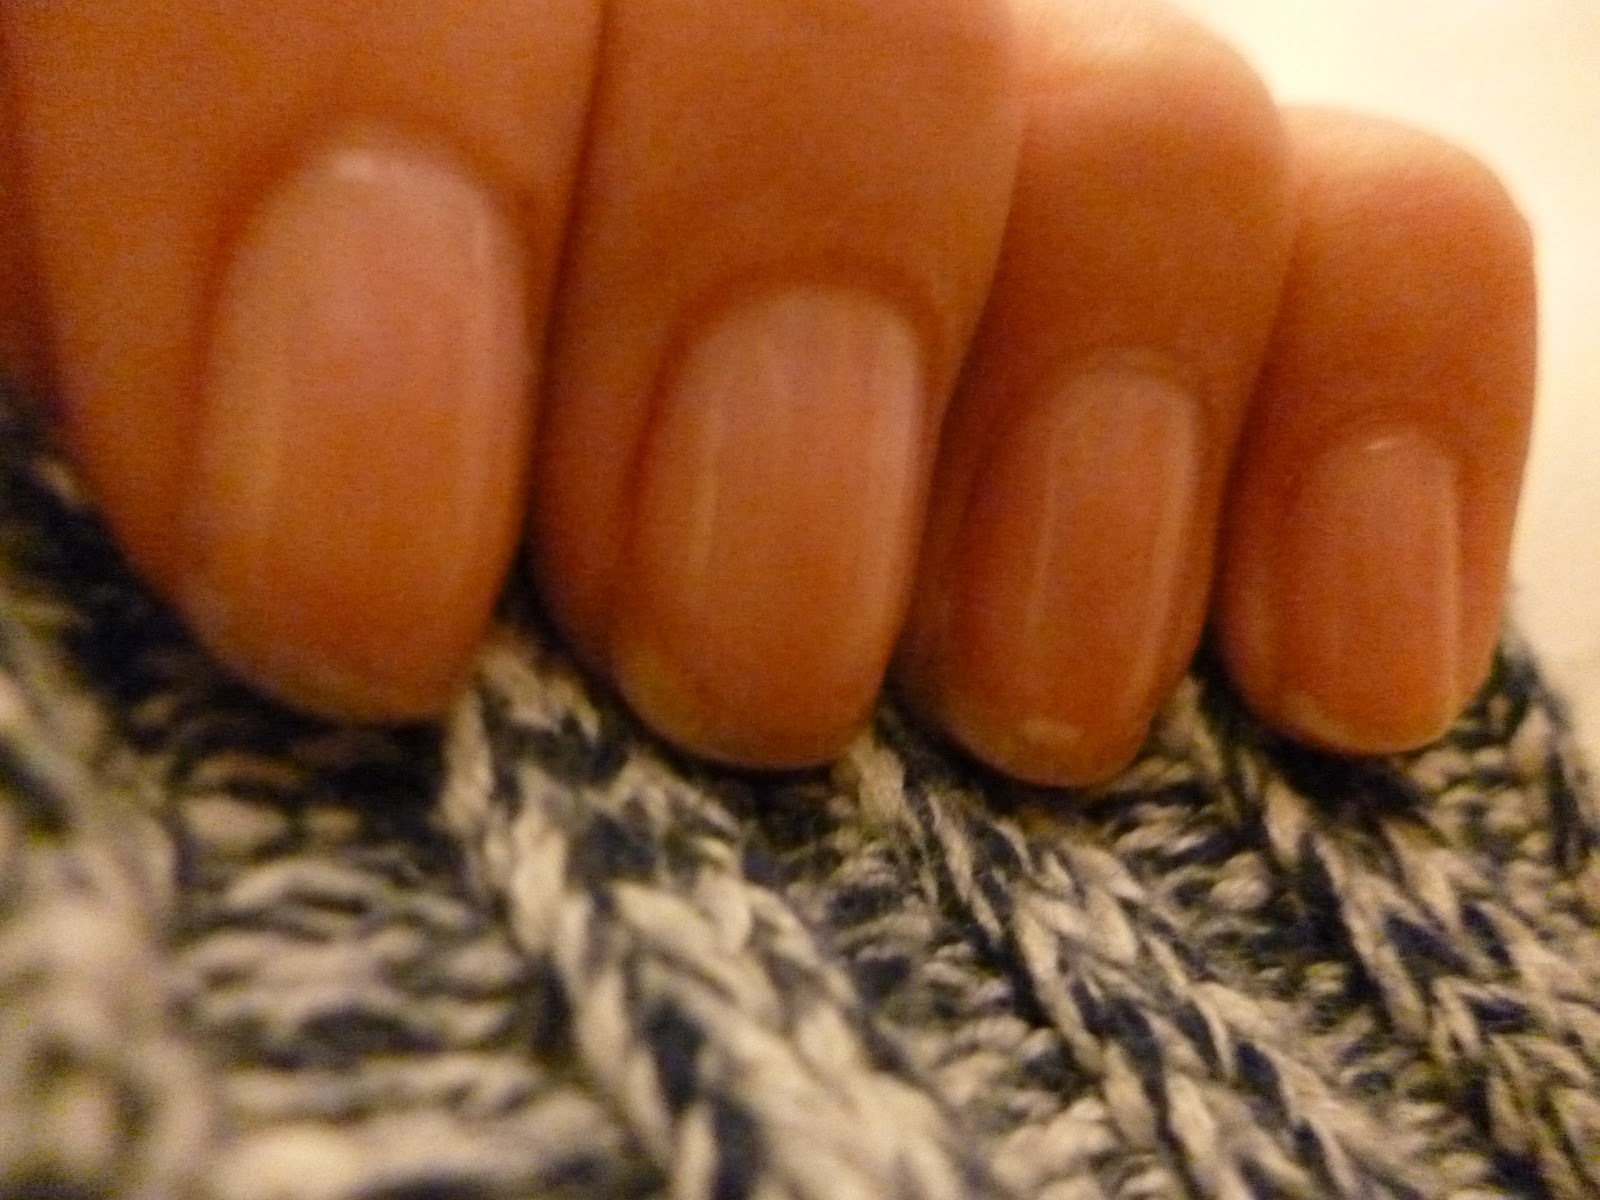 Nieuw Nail art by Sabine: Nail-art voor beginners: Panda nagels! KU-87